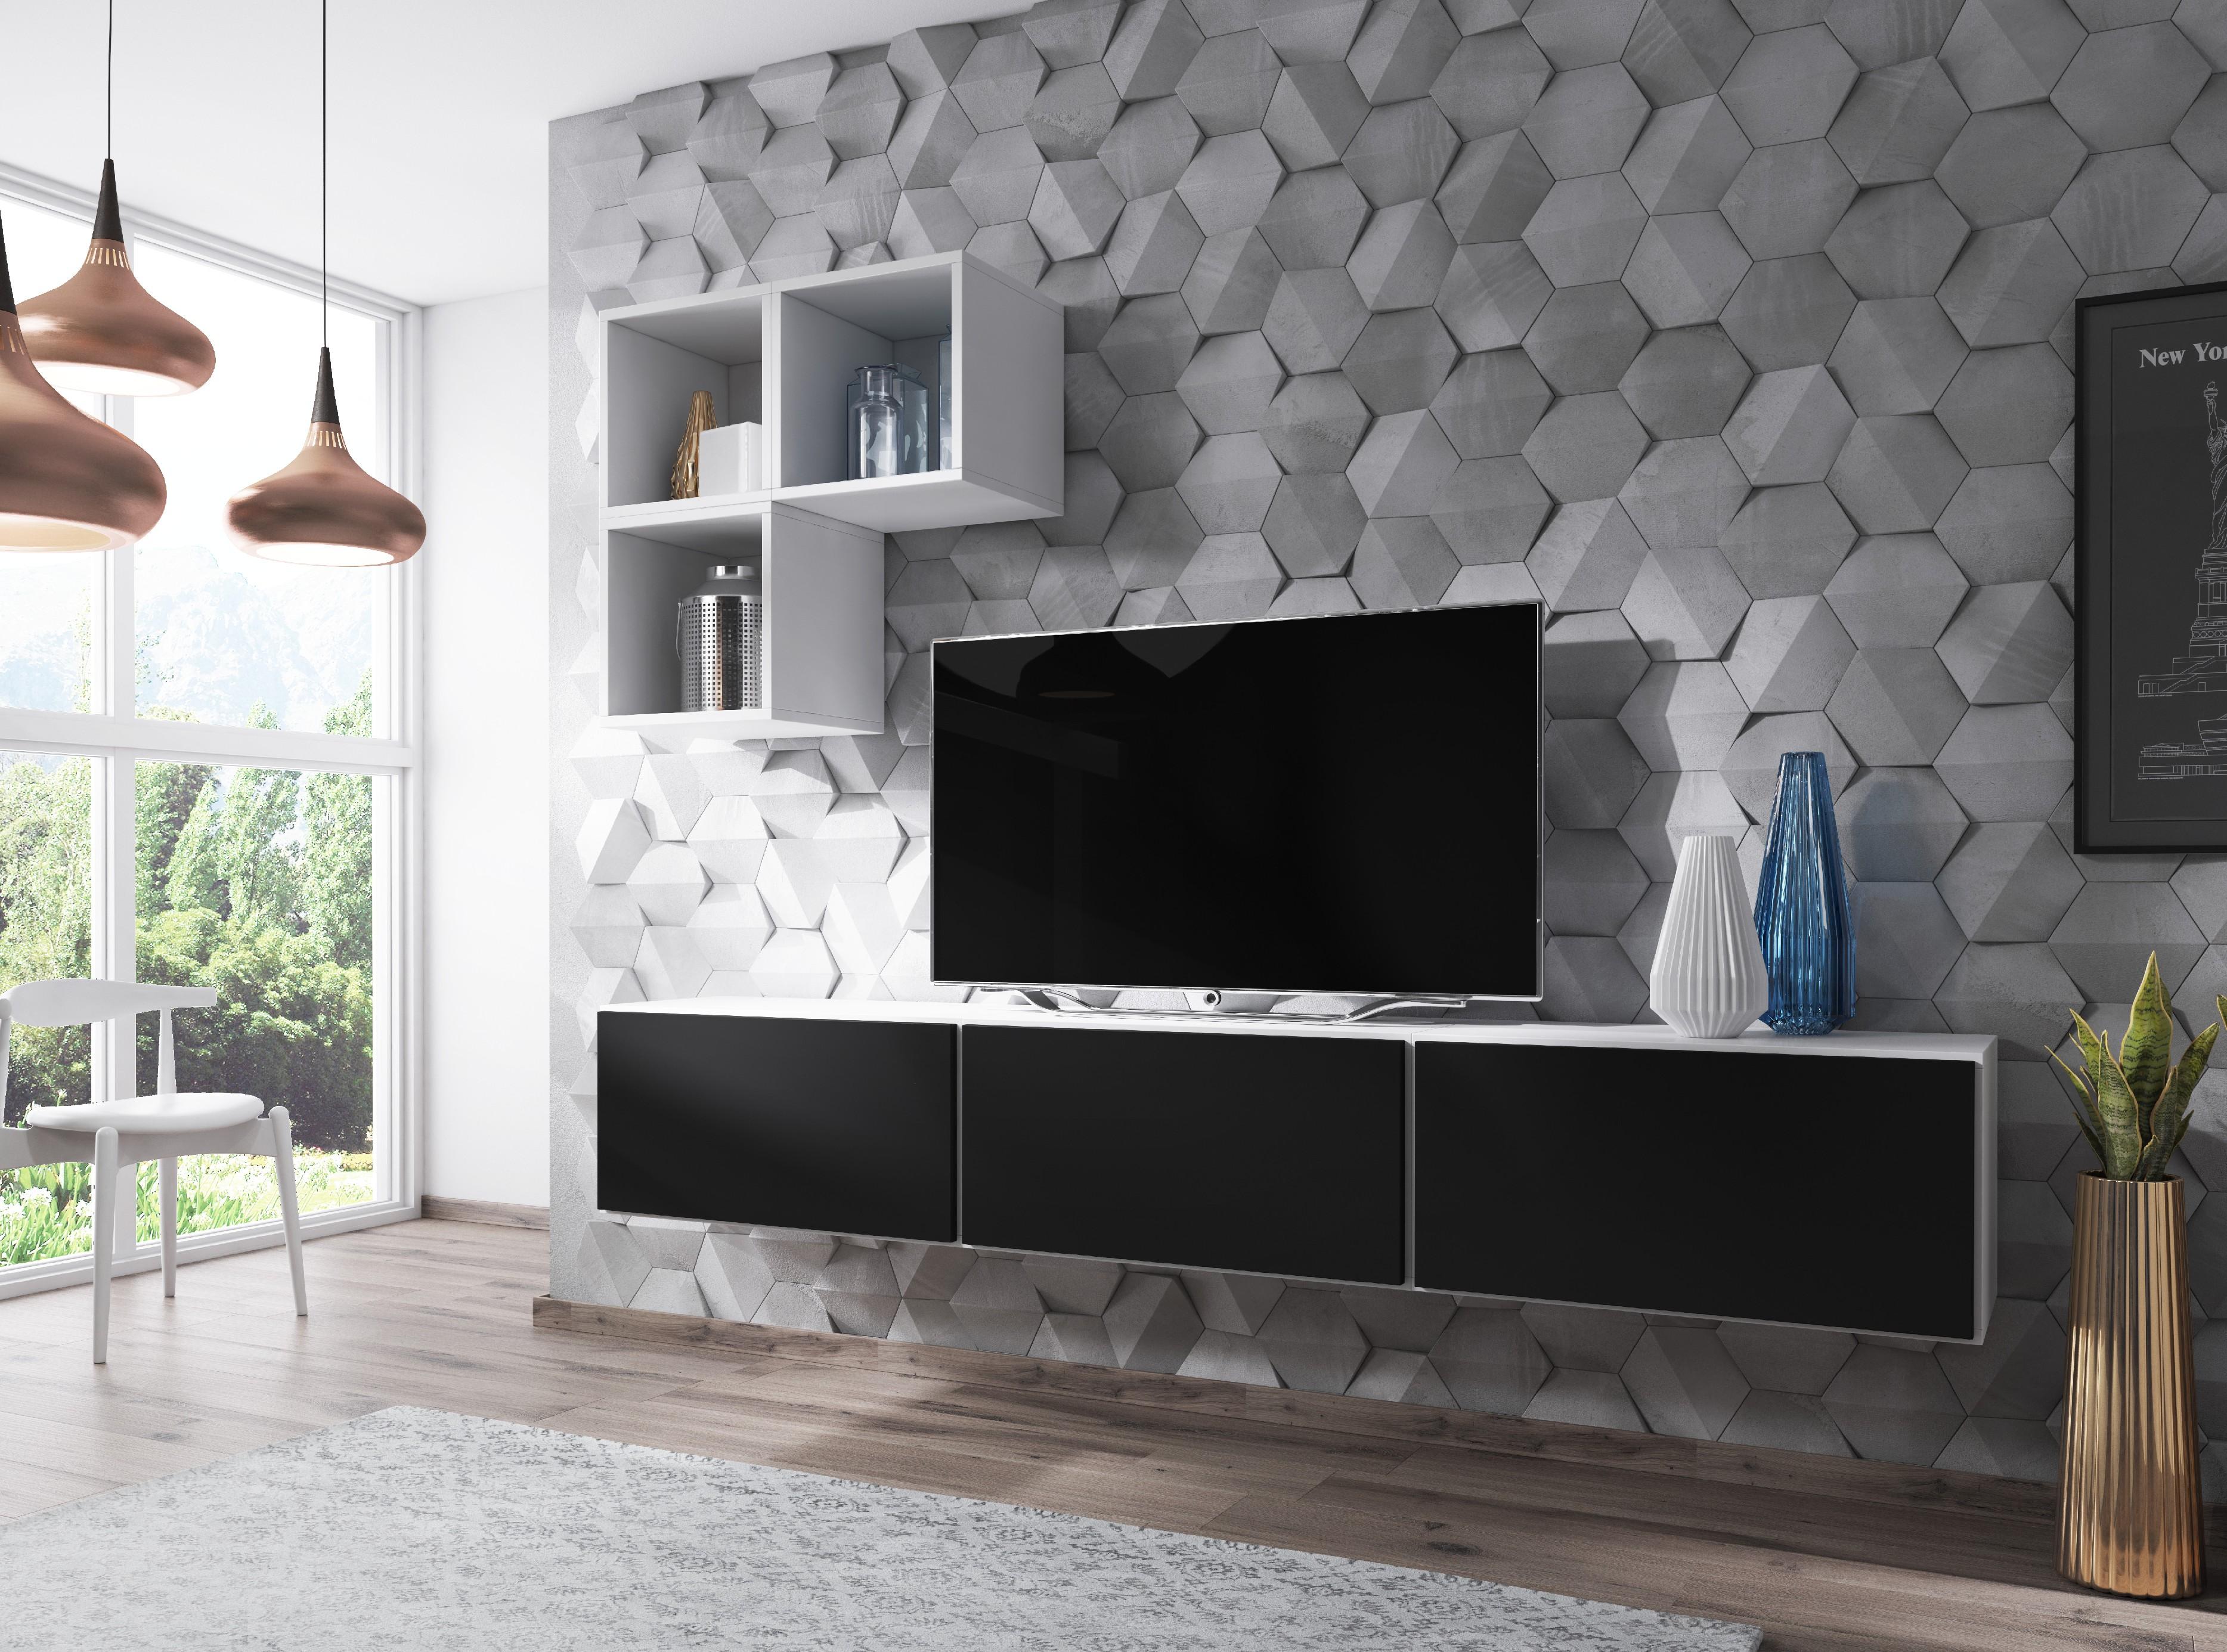 Artcam Obývacia stena ROCO 6 roco: korpus biely mat / okraj biely mat / dvierka čierny mat